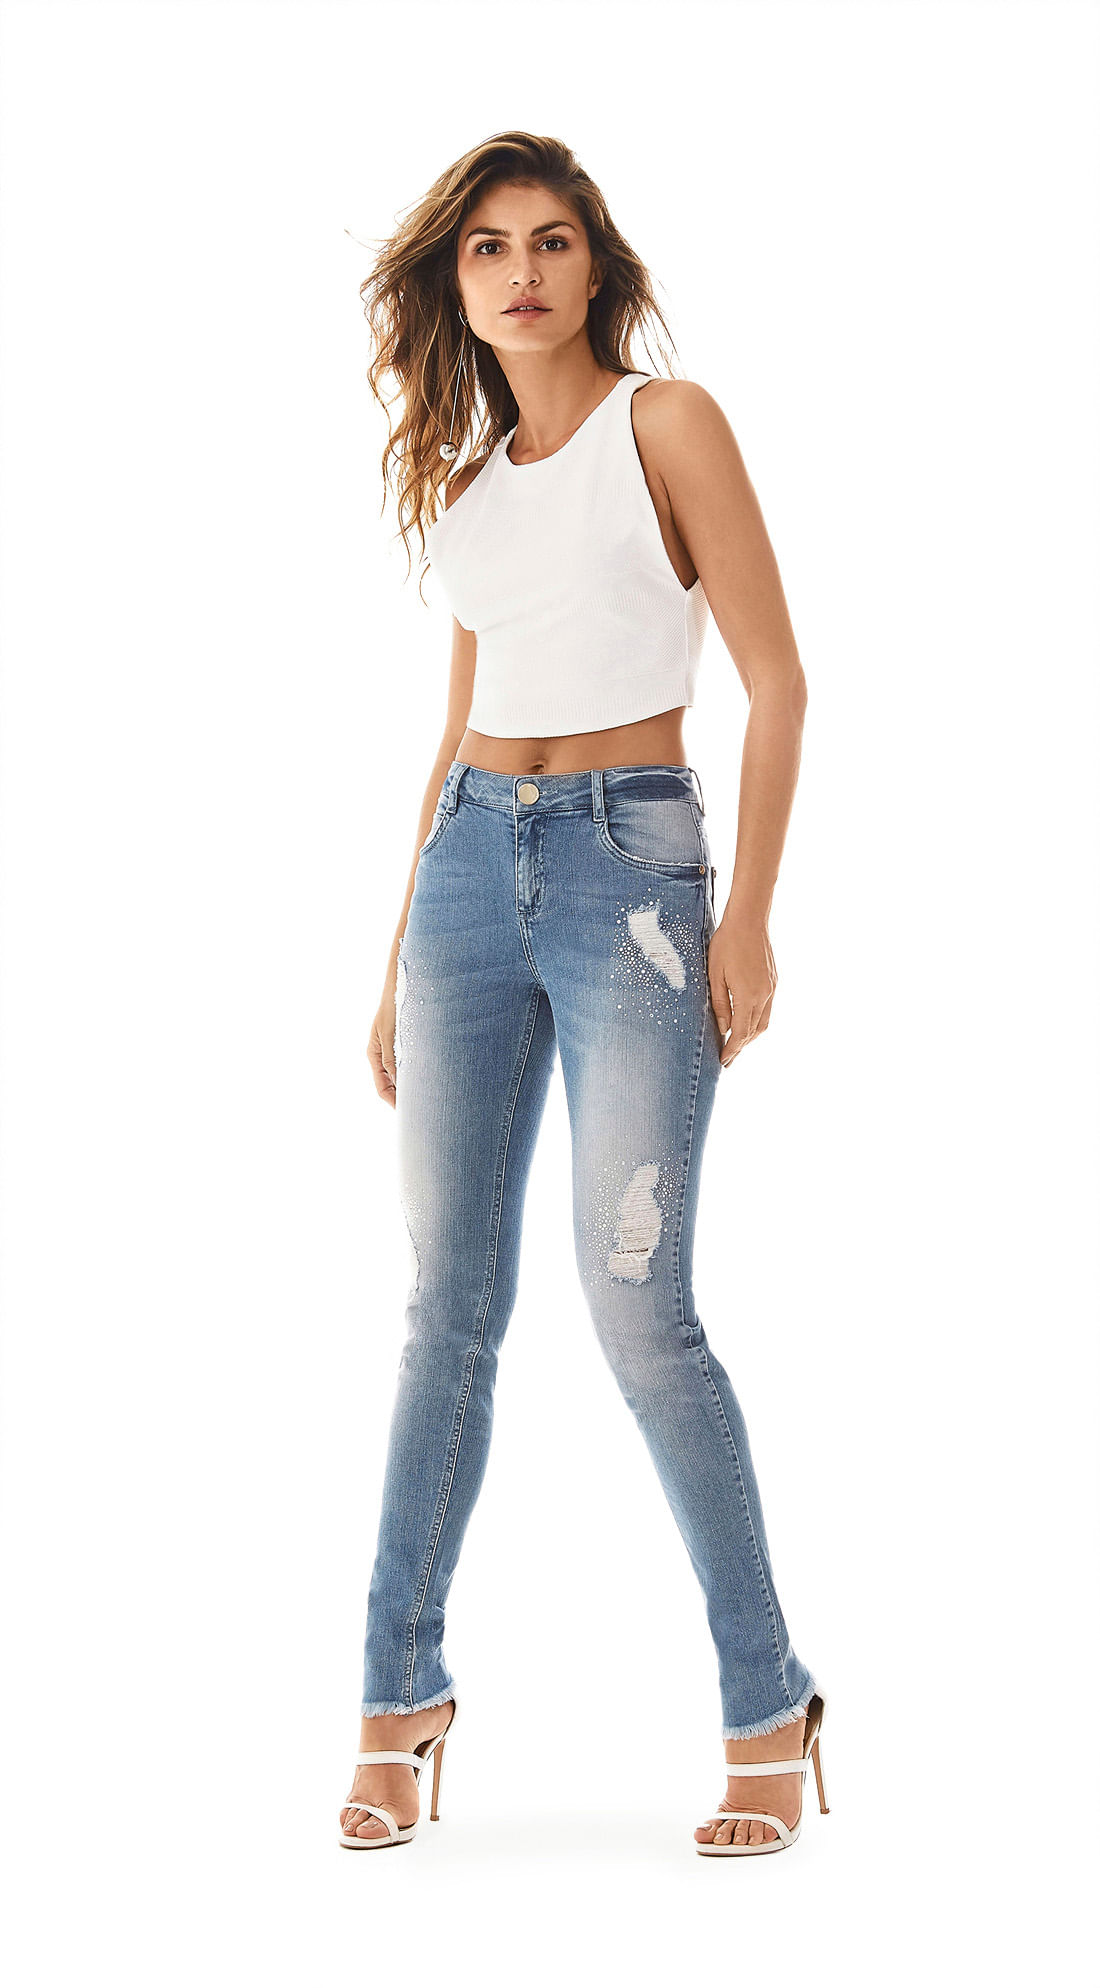 2777eef314 Calca Skinny Andreia Cos Intermediario Com Termocolante Jeans ...